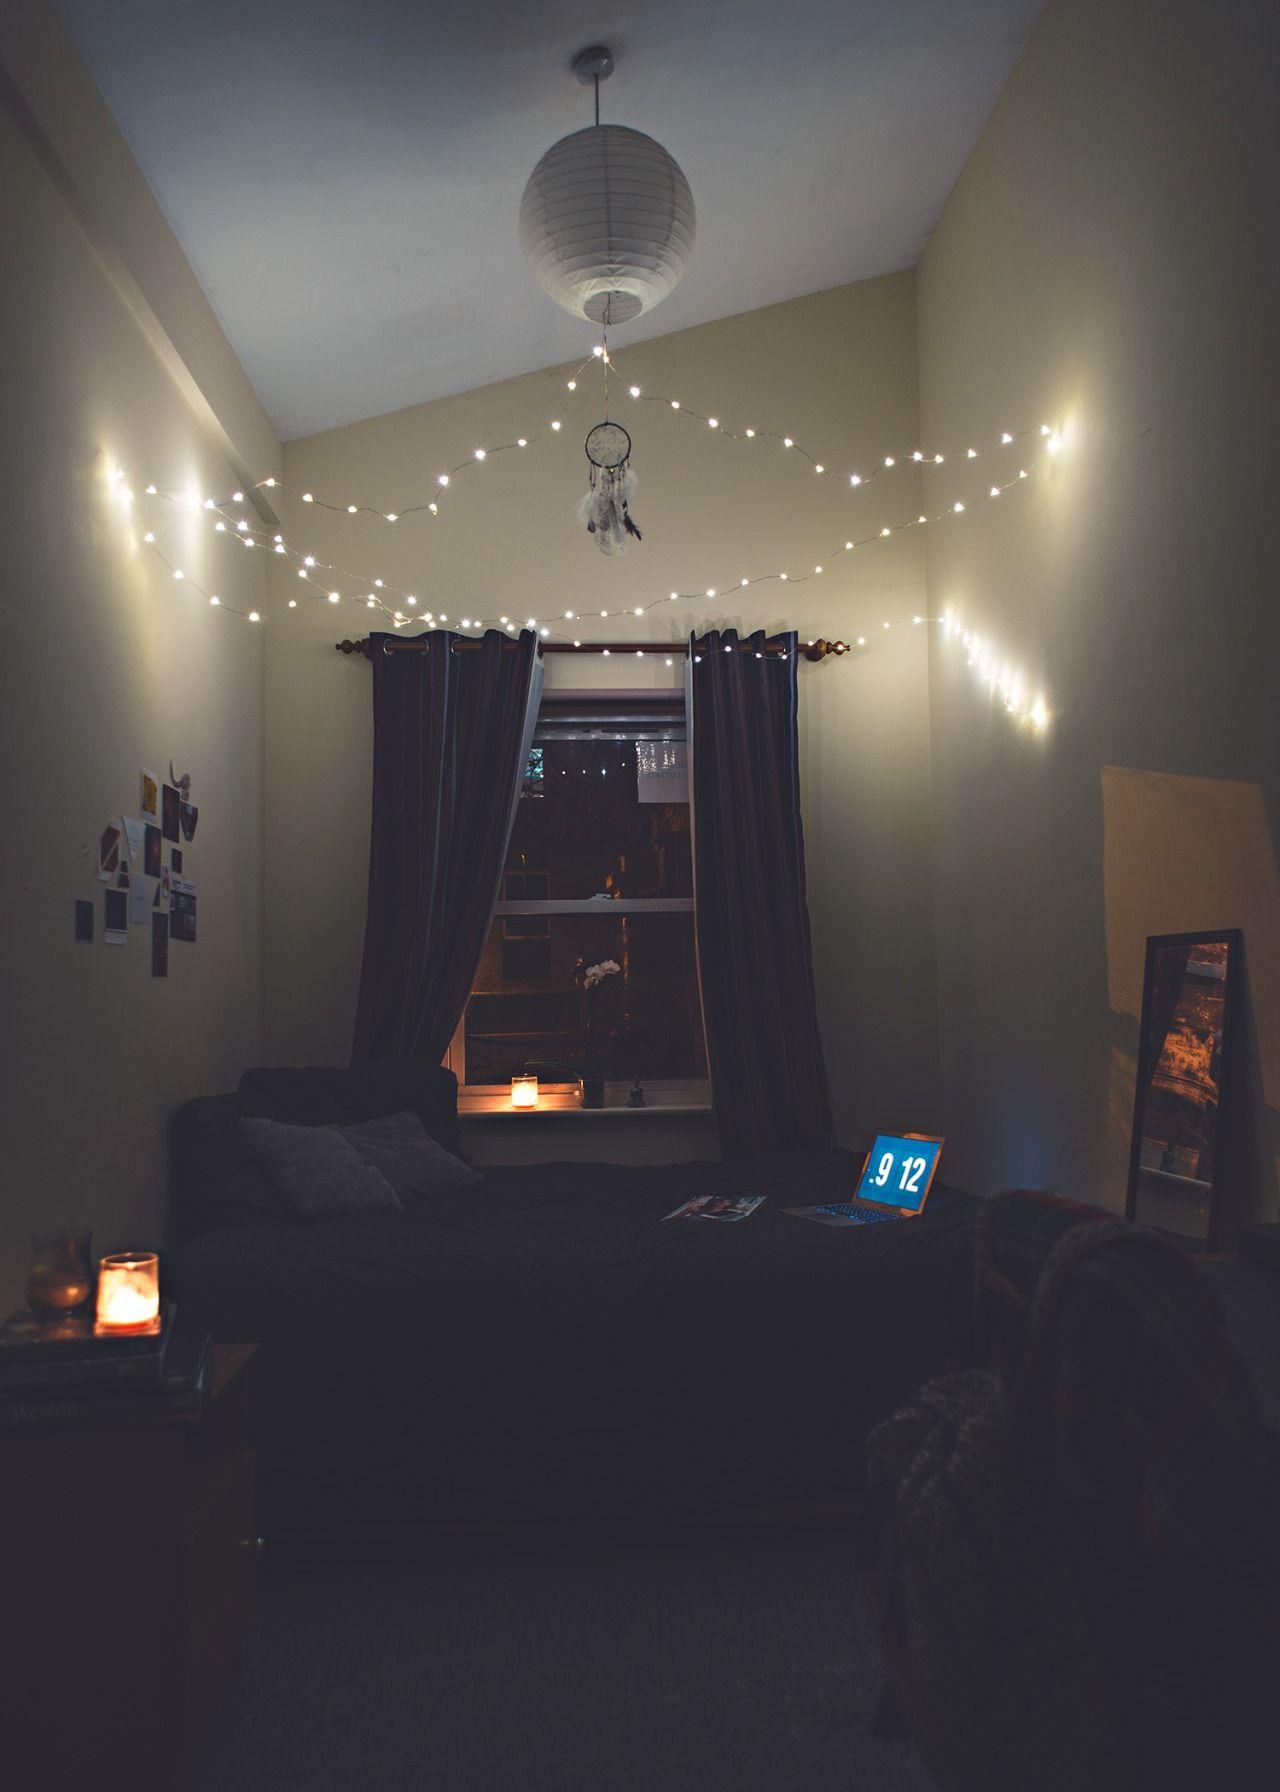 Snapchat: Life1nmot1on | Small bedroom | Interior. | small rooms ... for Diy Sleep Lamp  45ifm